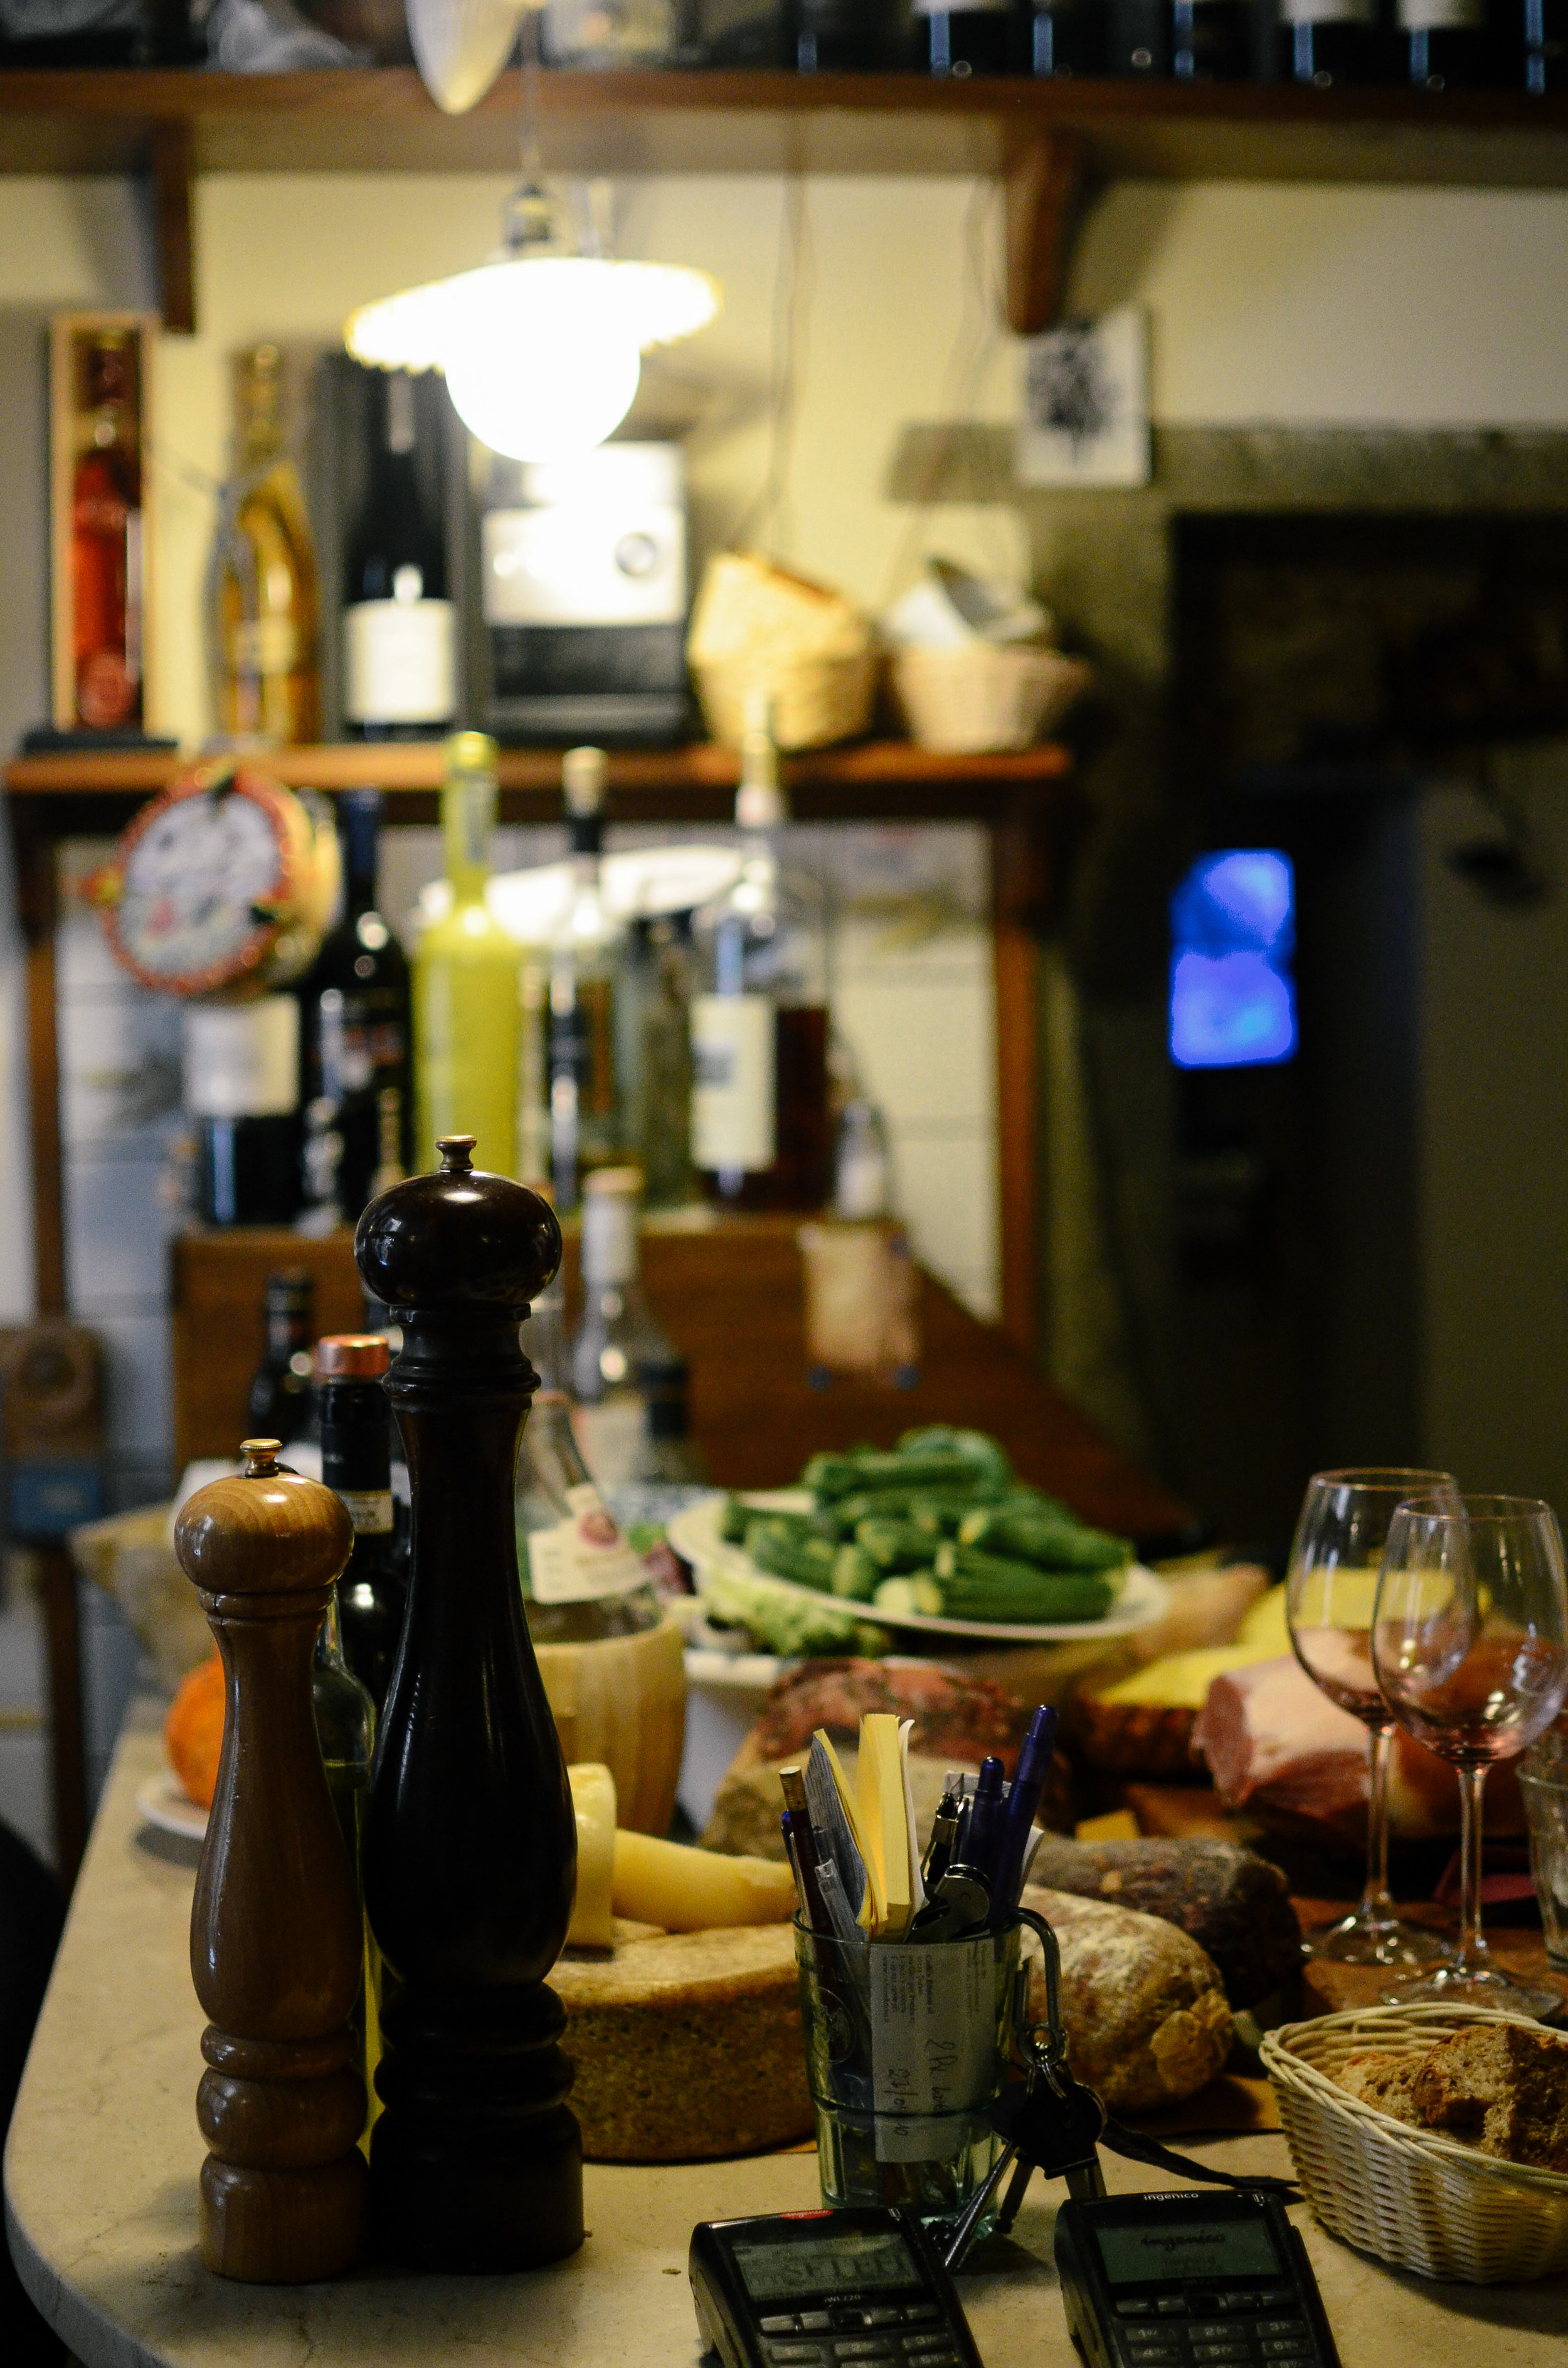 florence-italy-travel-guide-adventure-blog_DSC_0135.jpg